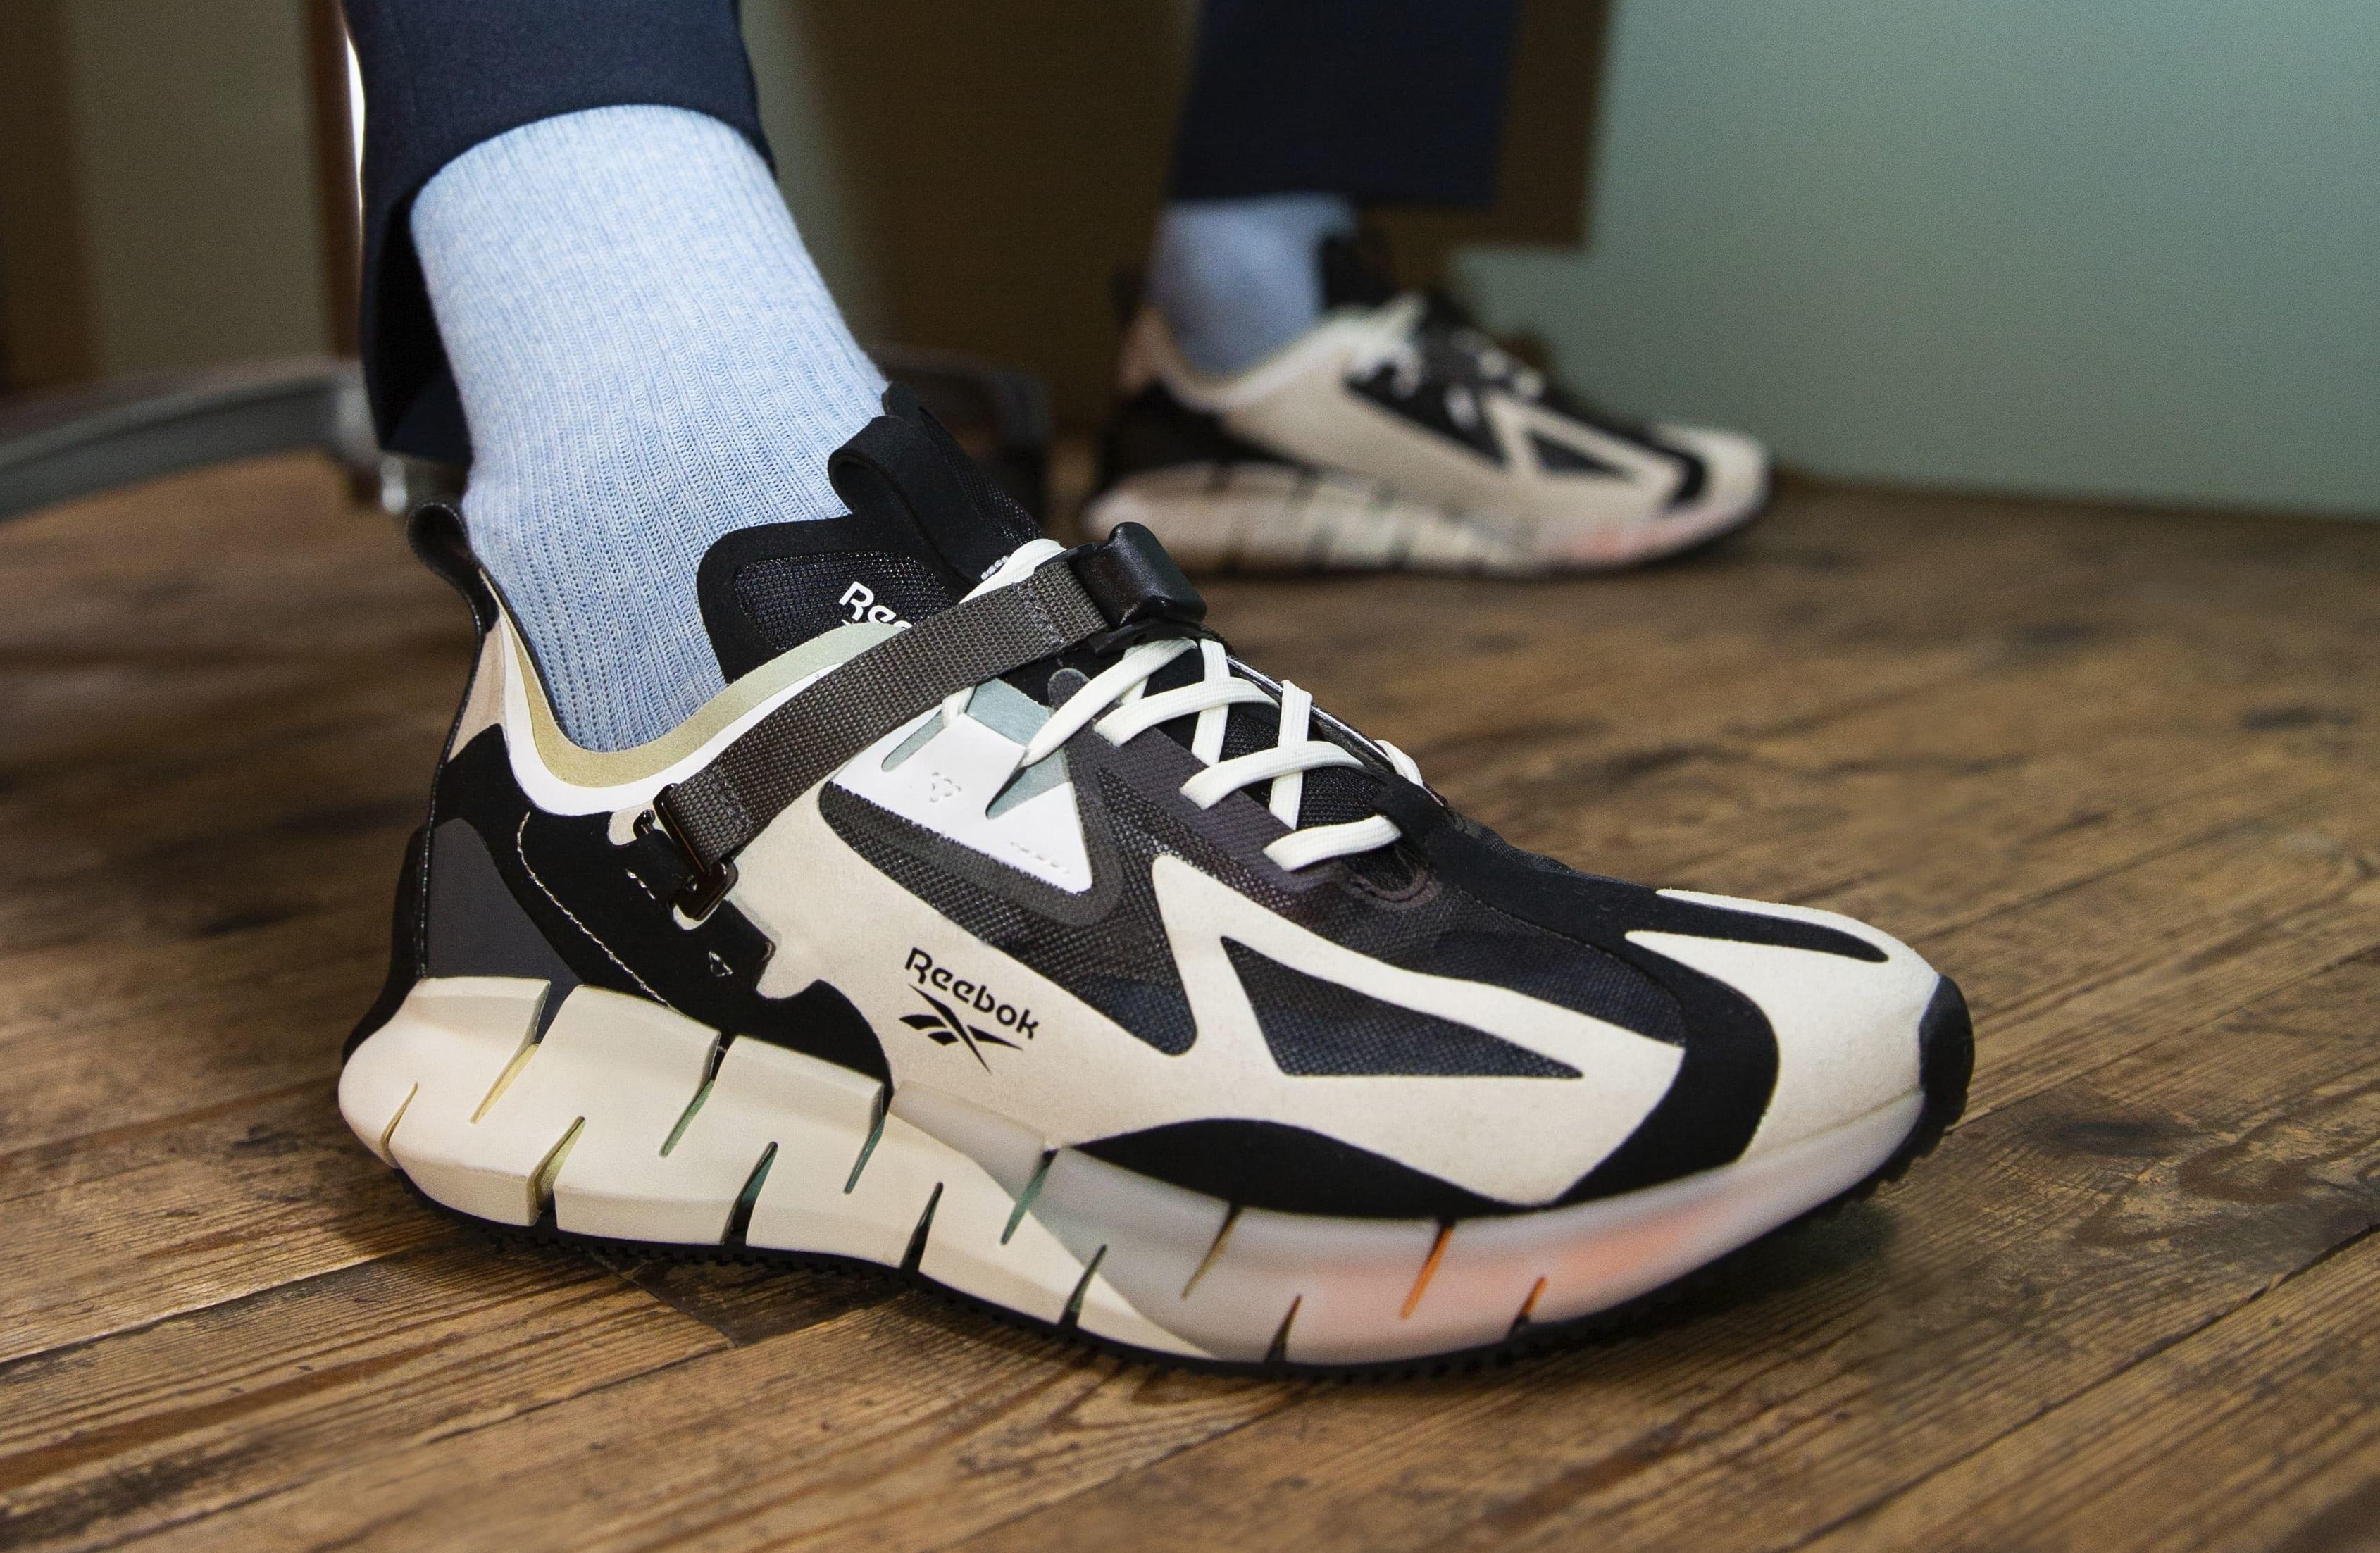 Reebok Zig Kinetica Concept Type 1 (White/Black On-Foot)